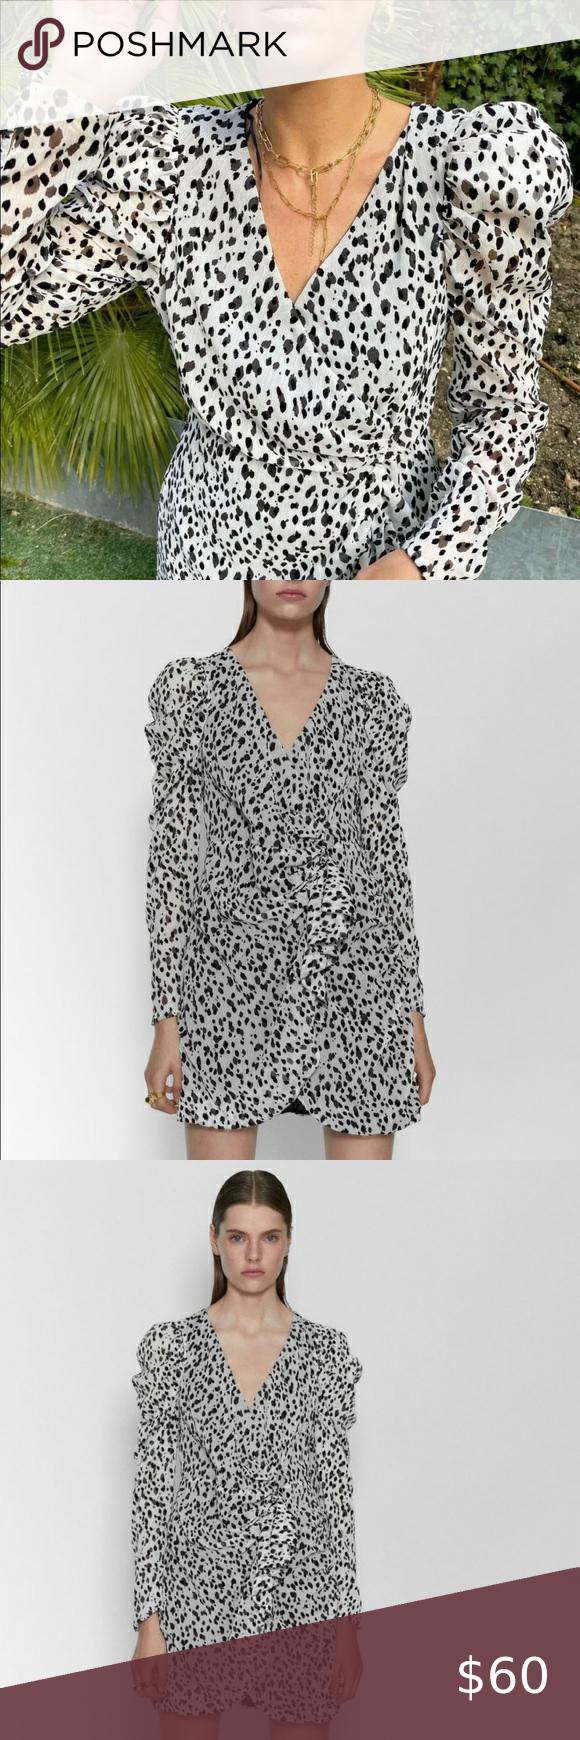 Zara Ss20 White Animal Print Dress Ref 8342 102 Animal Print Dresses Print Dress Clothes Design [ 1740 x 580 Pixel ]